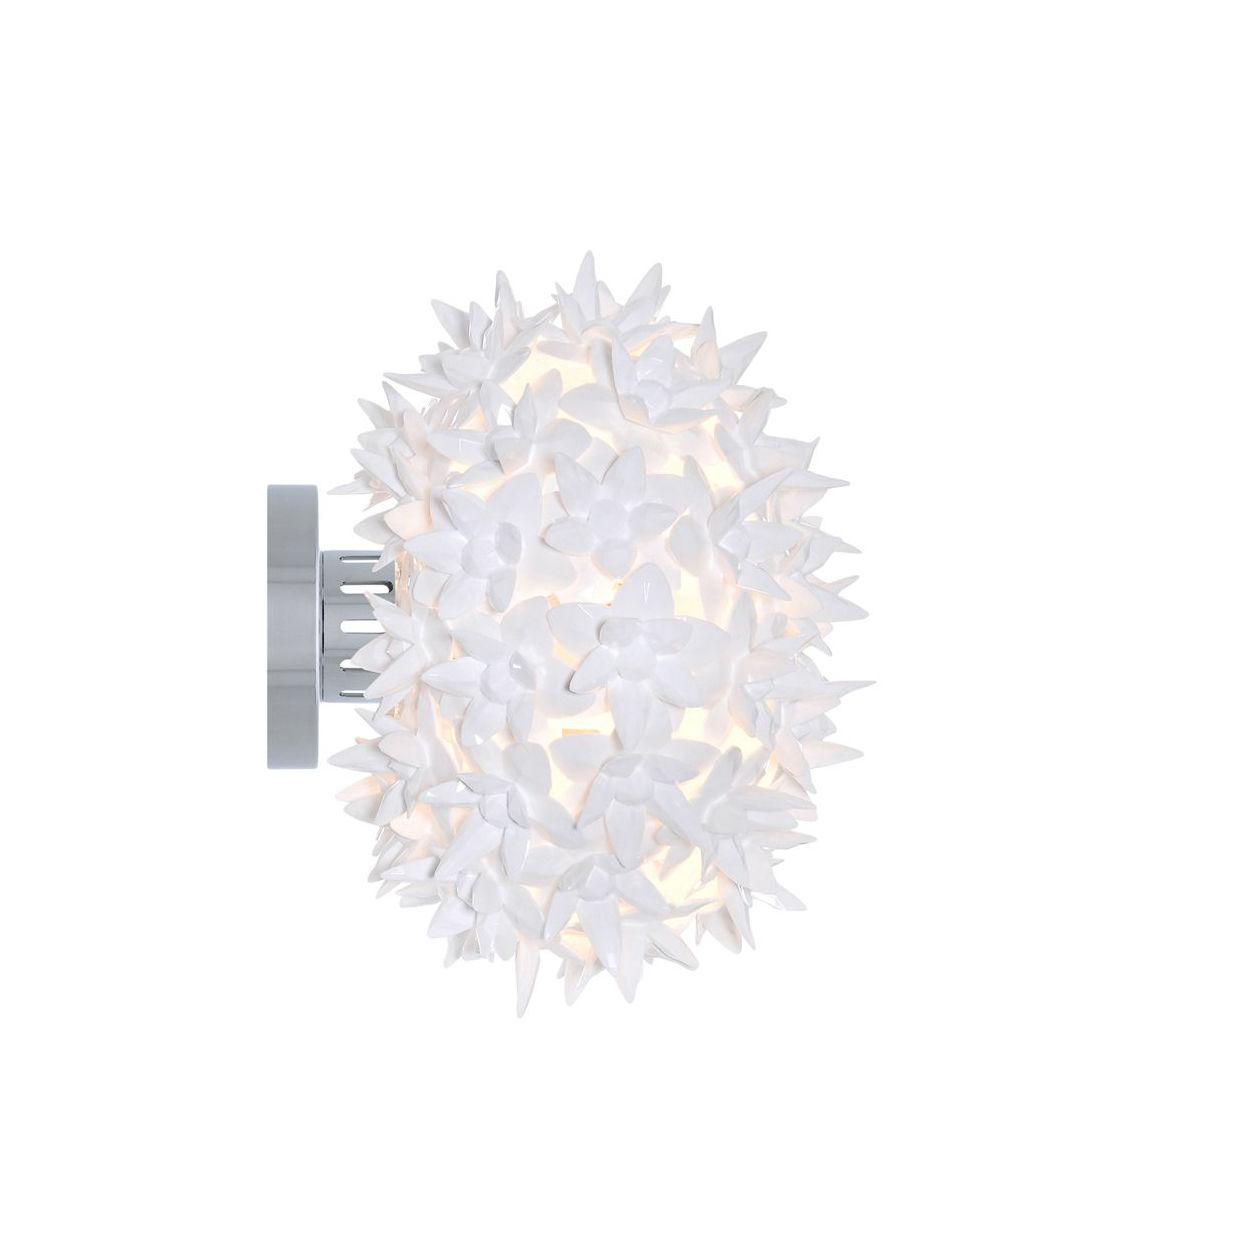 Bloom wandlamp Kartell wit